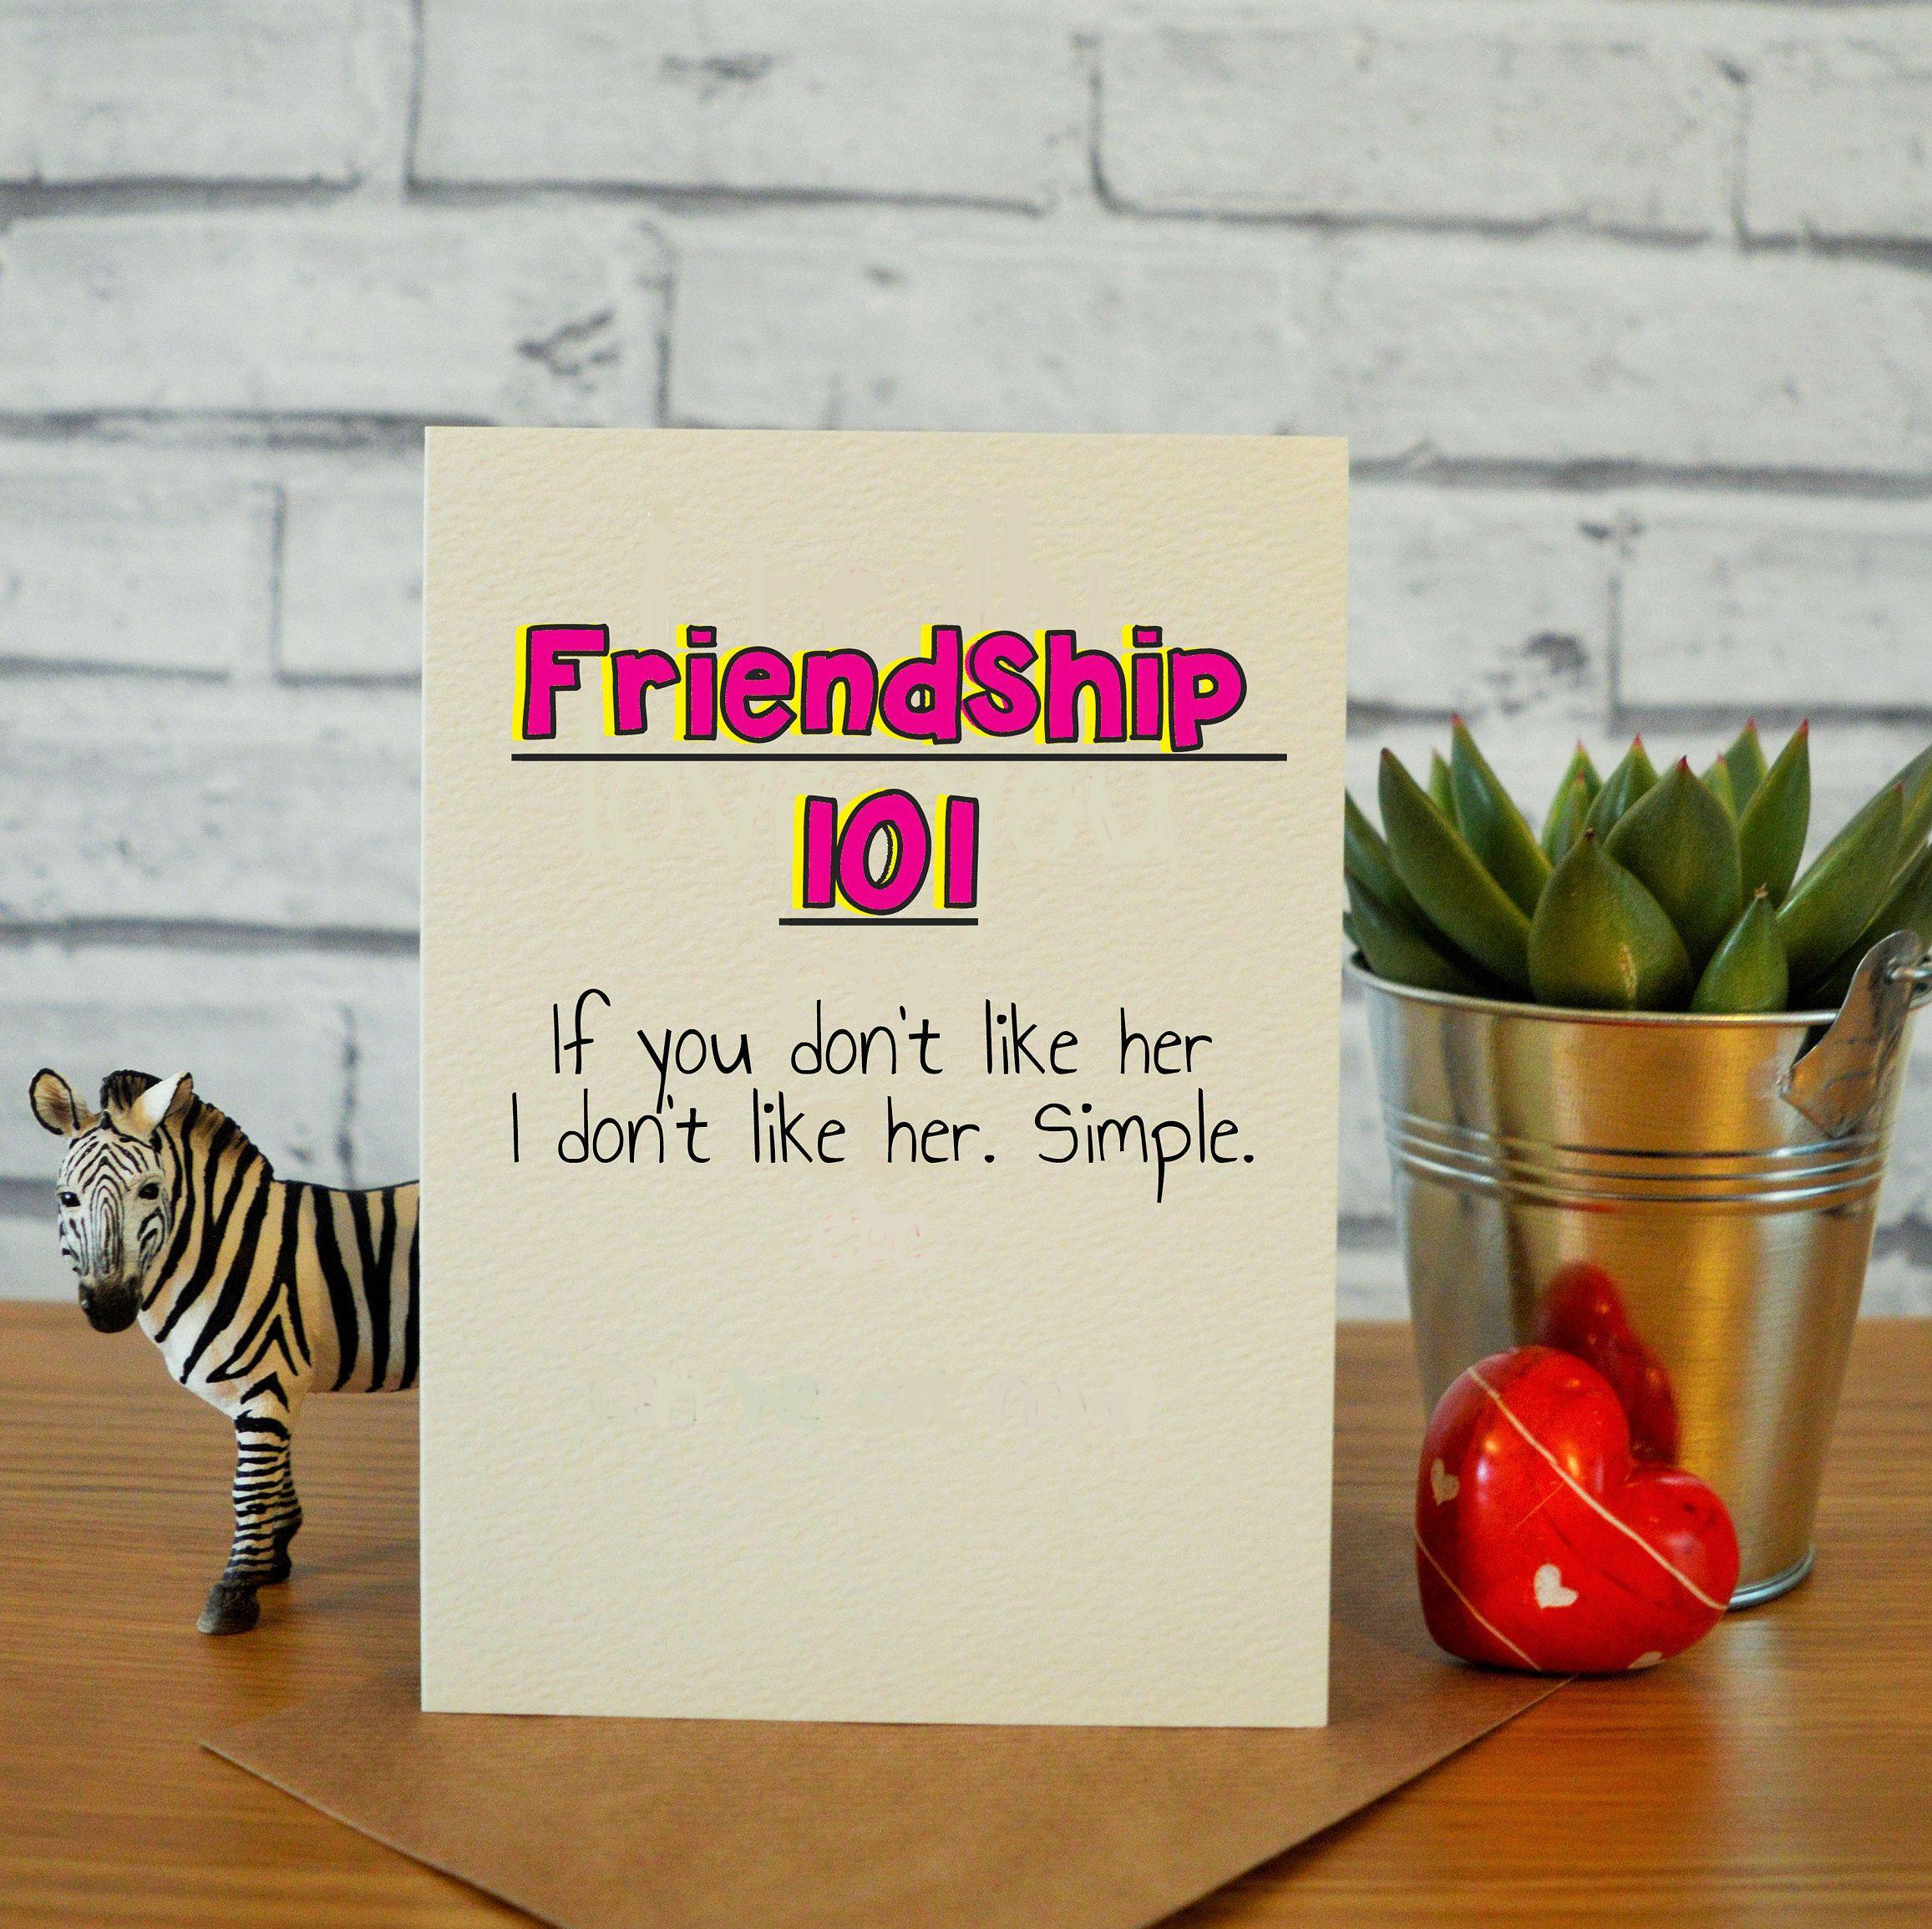 Best Friend Birthday Card Funny Best Friend Birthday Card Etsy Birthday Cards For Friends Best Friend Birthday Cards Funny Birthday Cards